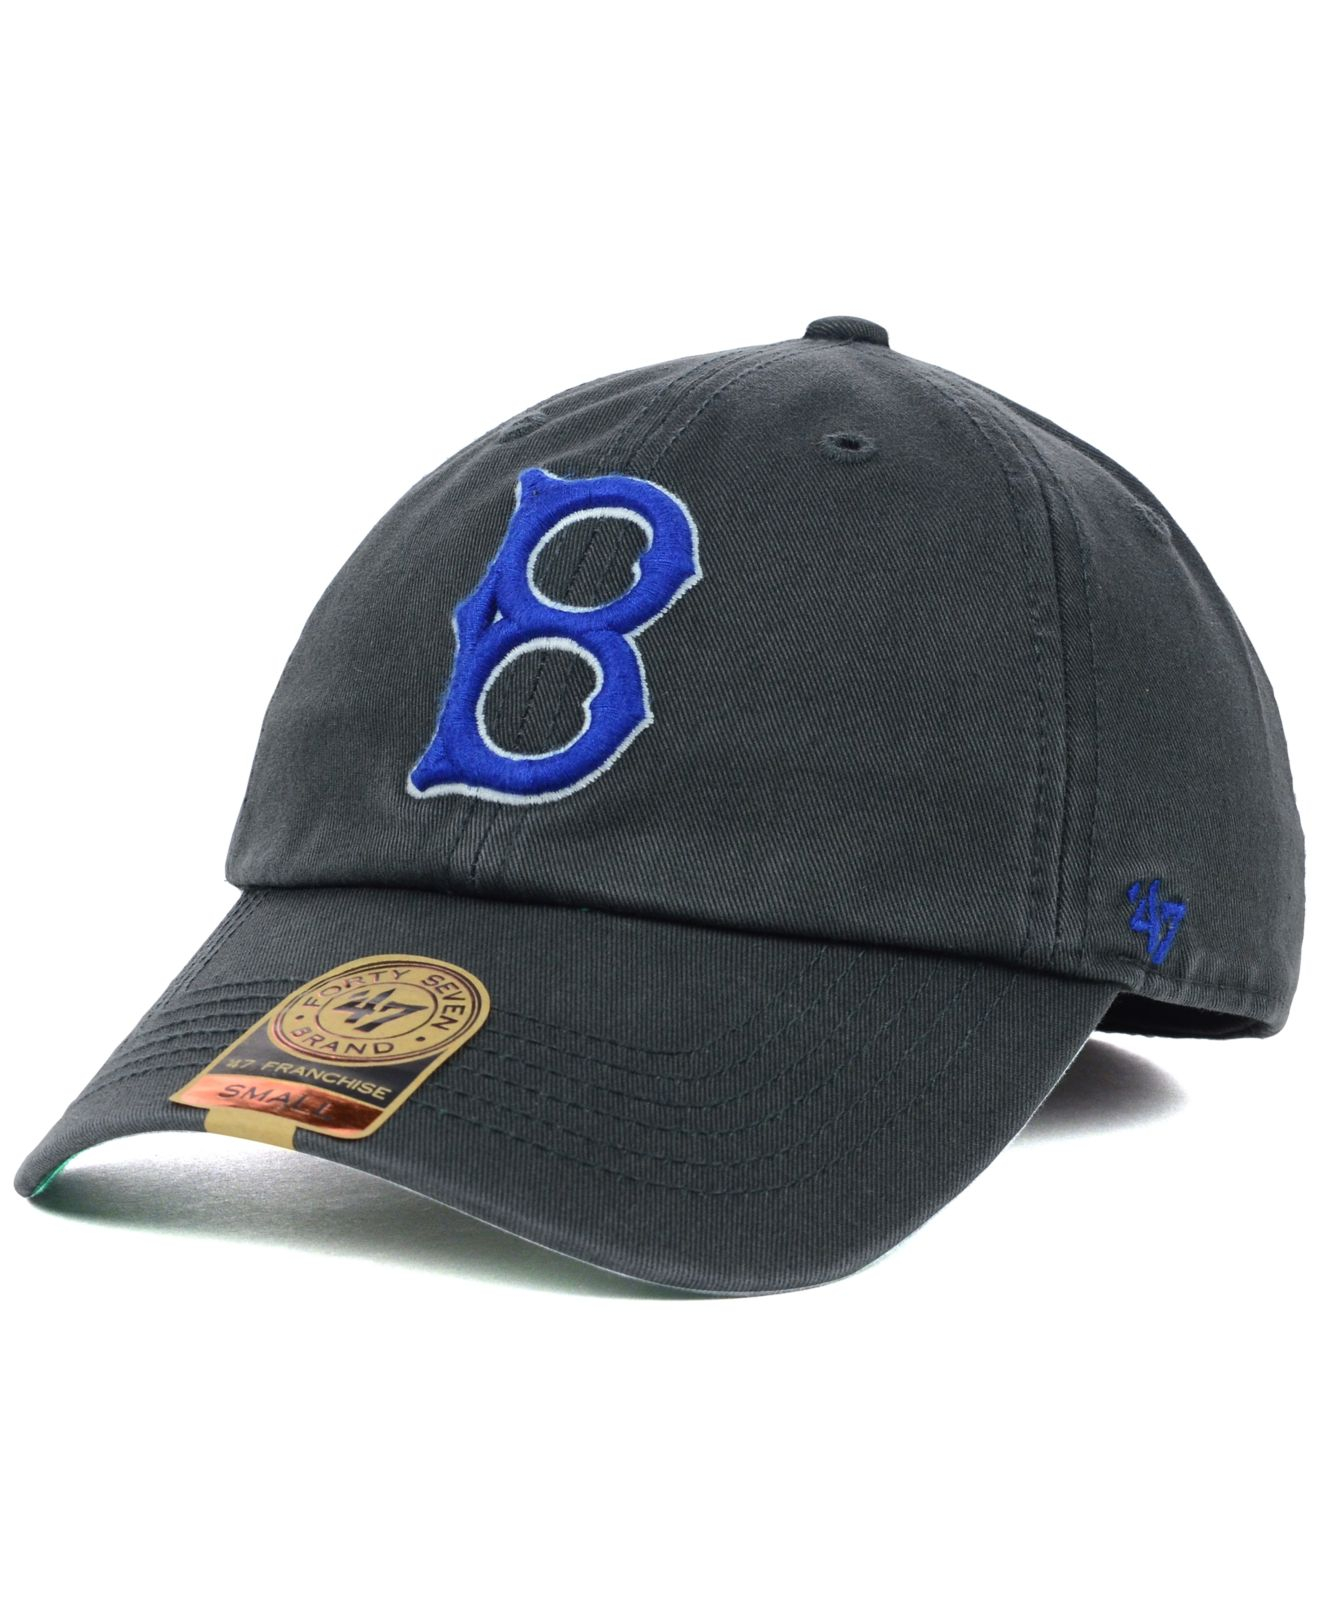 Brooklyn Dodgers Hat 47